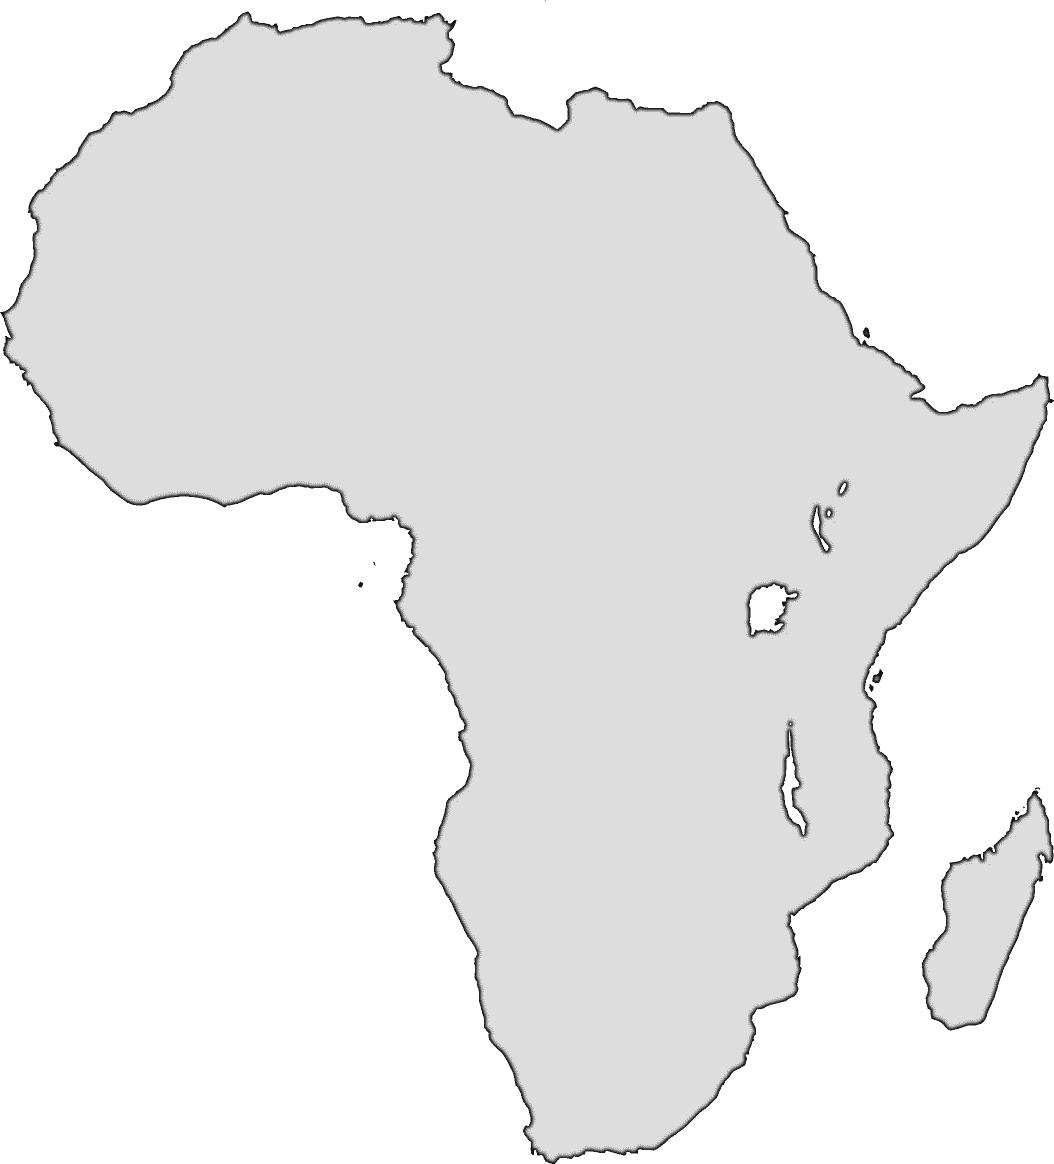 Colour Line Art Design : Image africa large bw thefutureofeuropes wiki